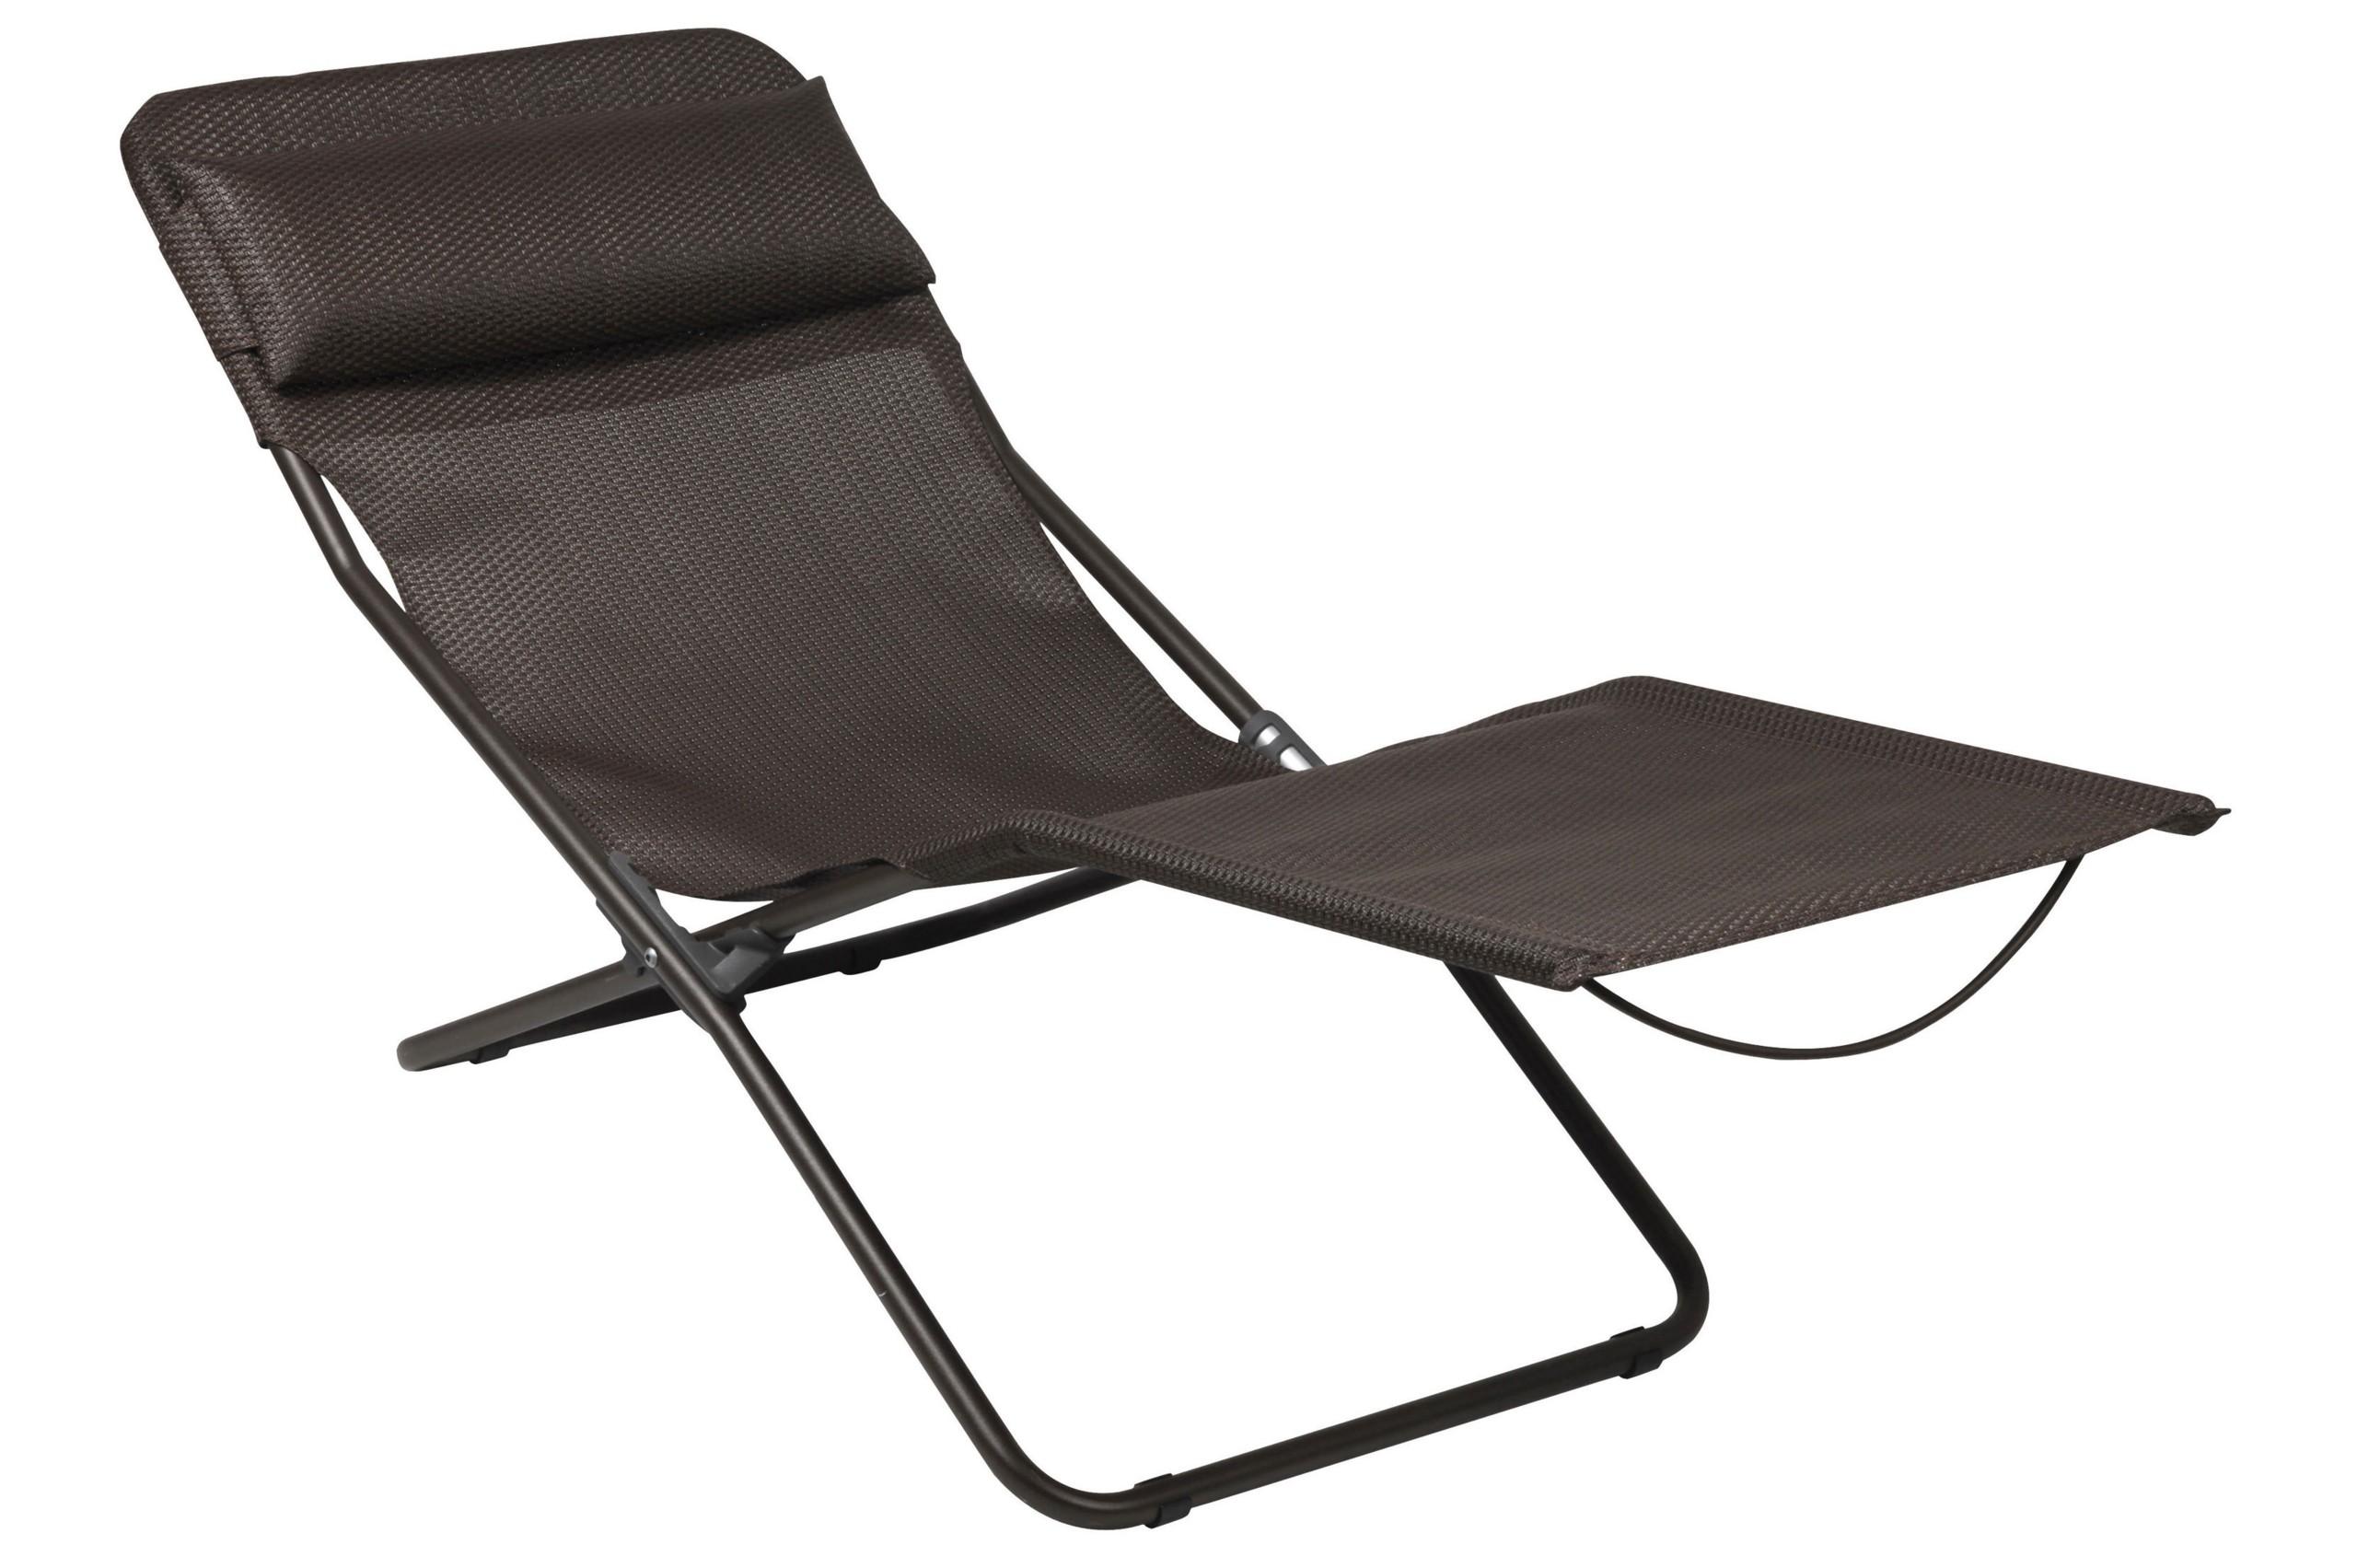 Gentil Lafuma Transalounge Folding Recliner Chair   MOKA/MARRON BROWN